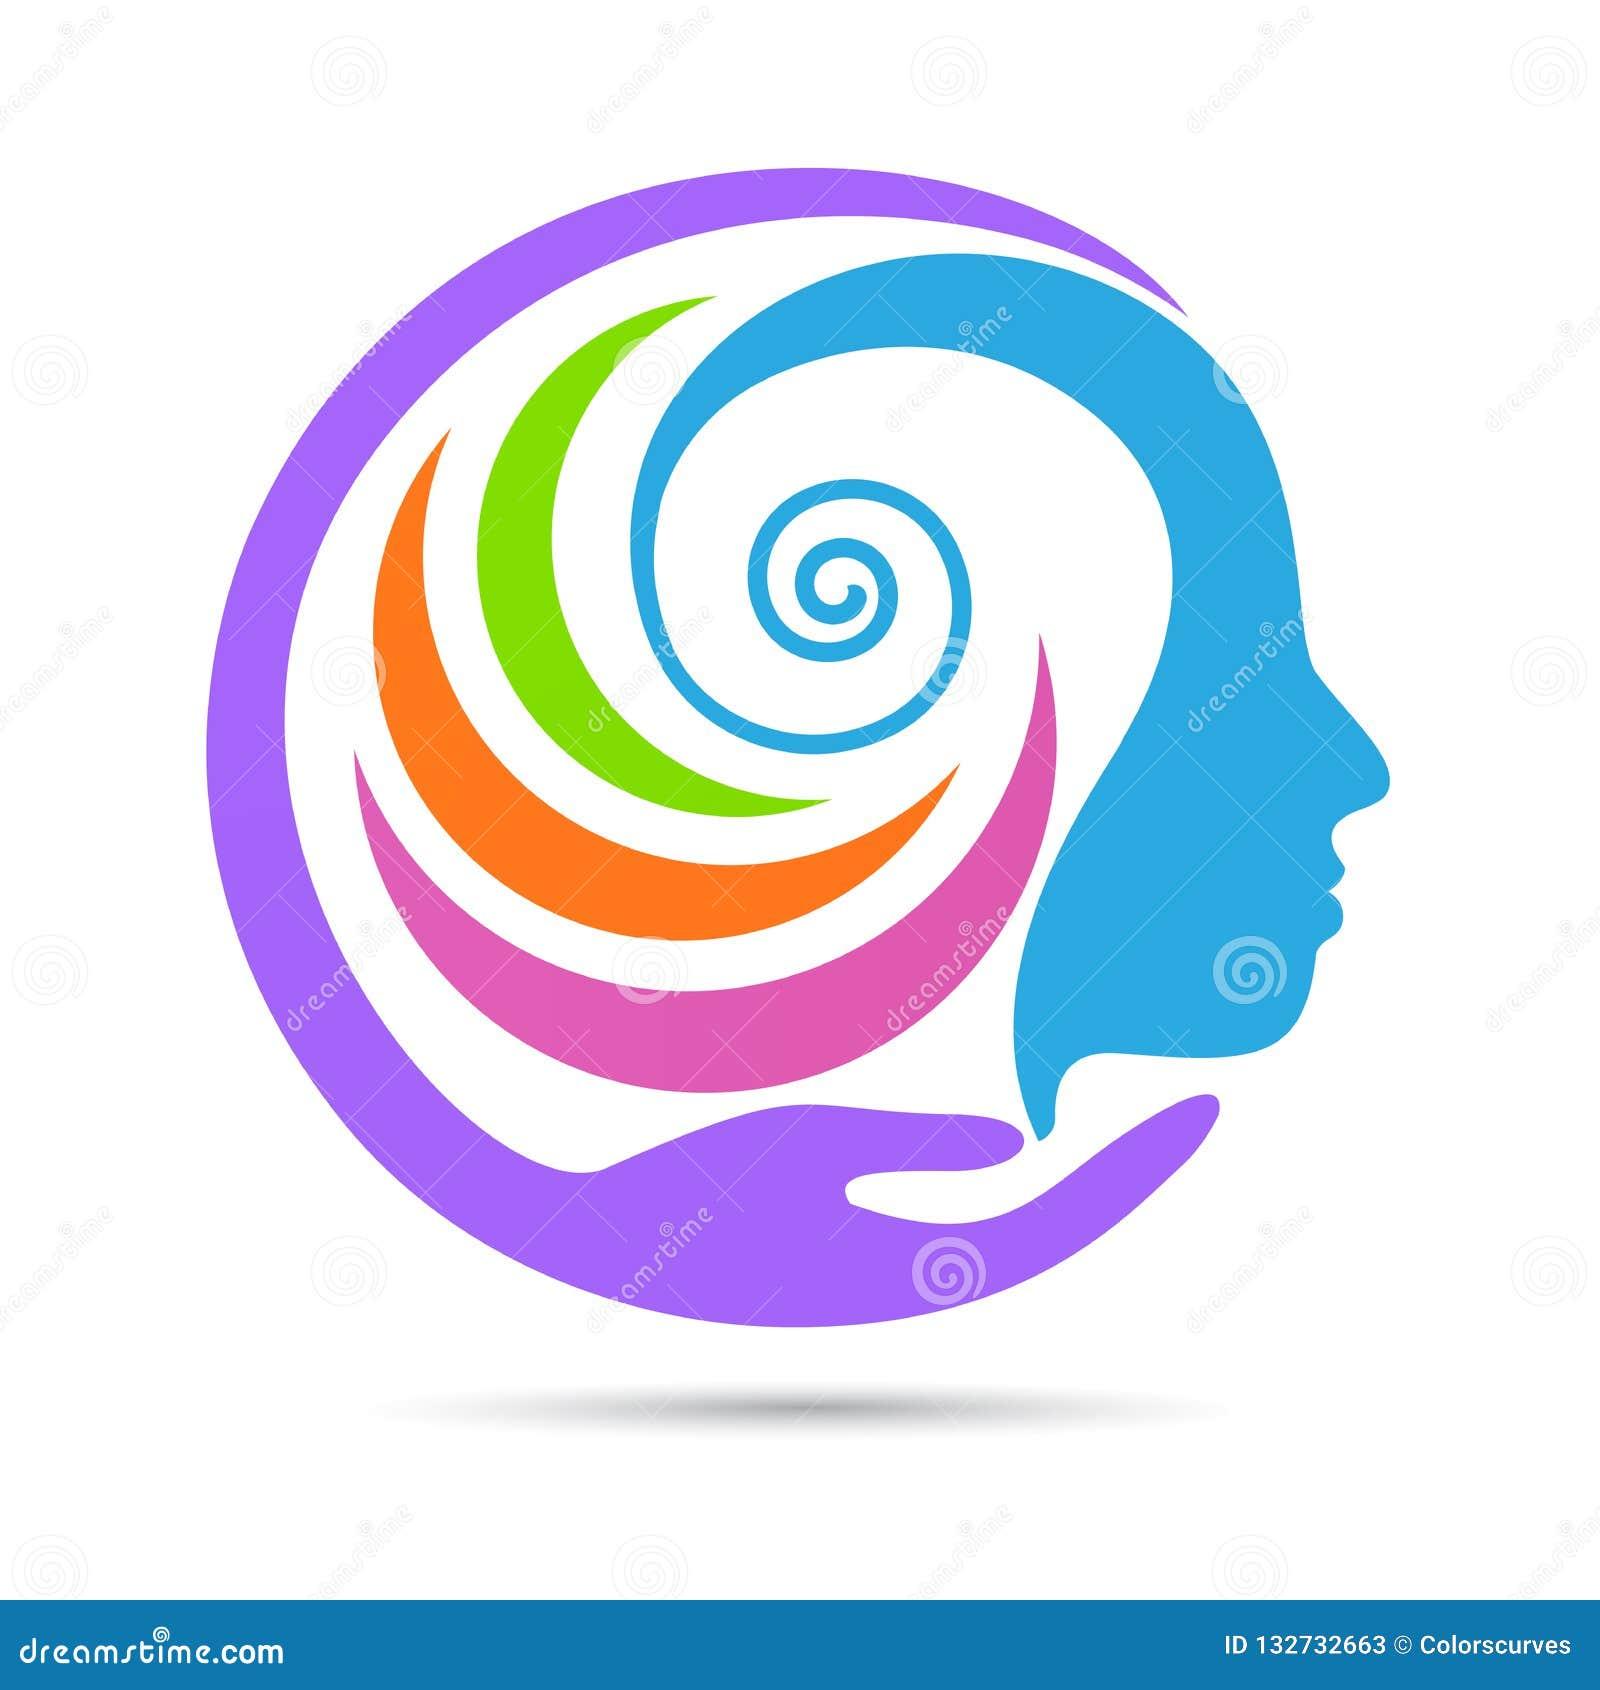 Human creative mind care logo